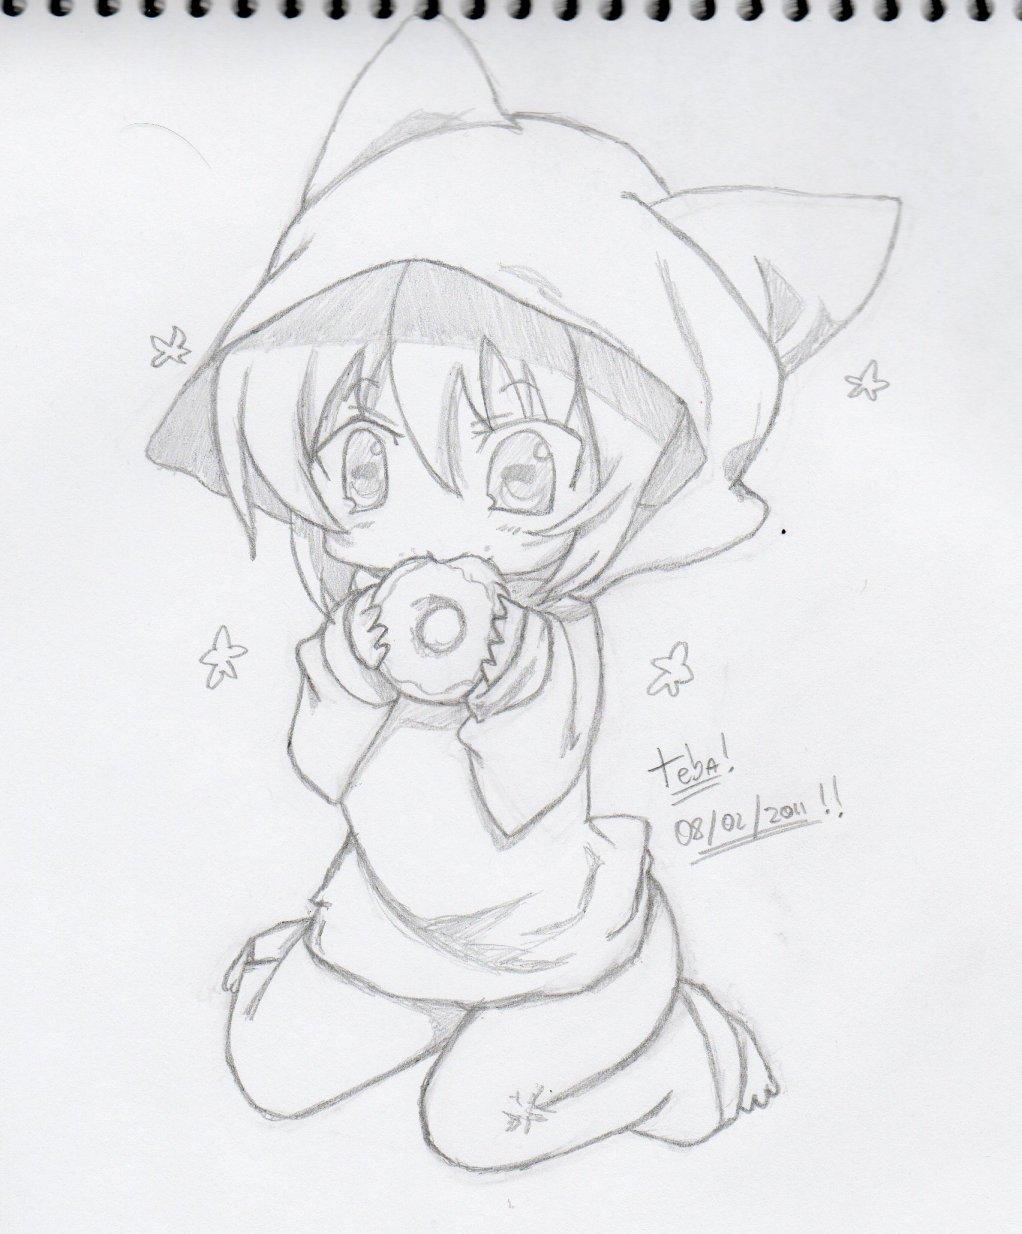 Dibujos De Ninos Imagenes De Anime Kawaii Para Pintar